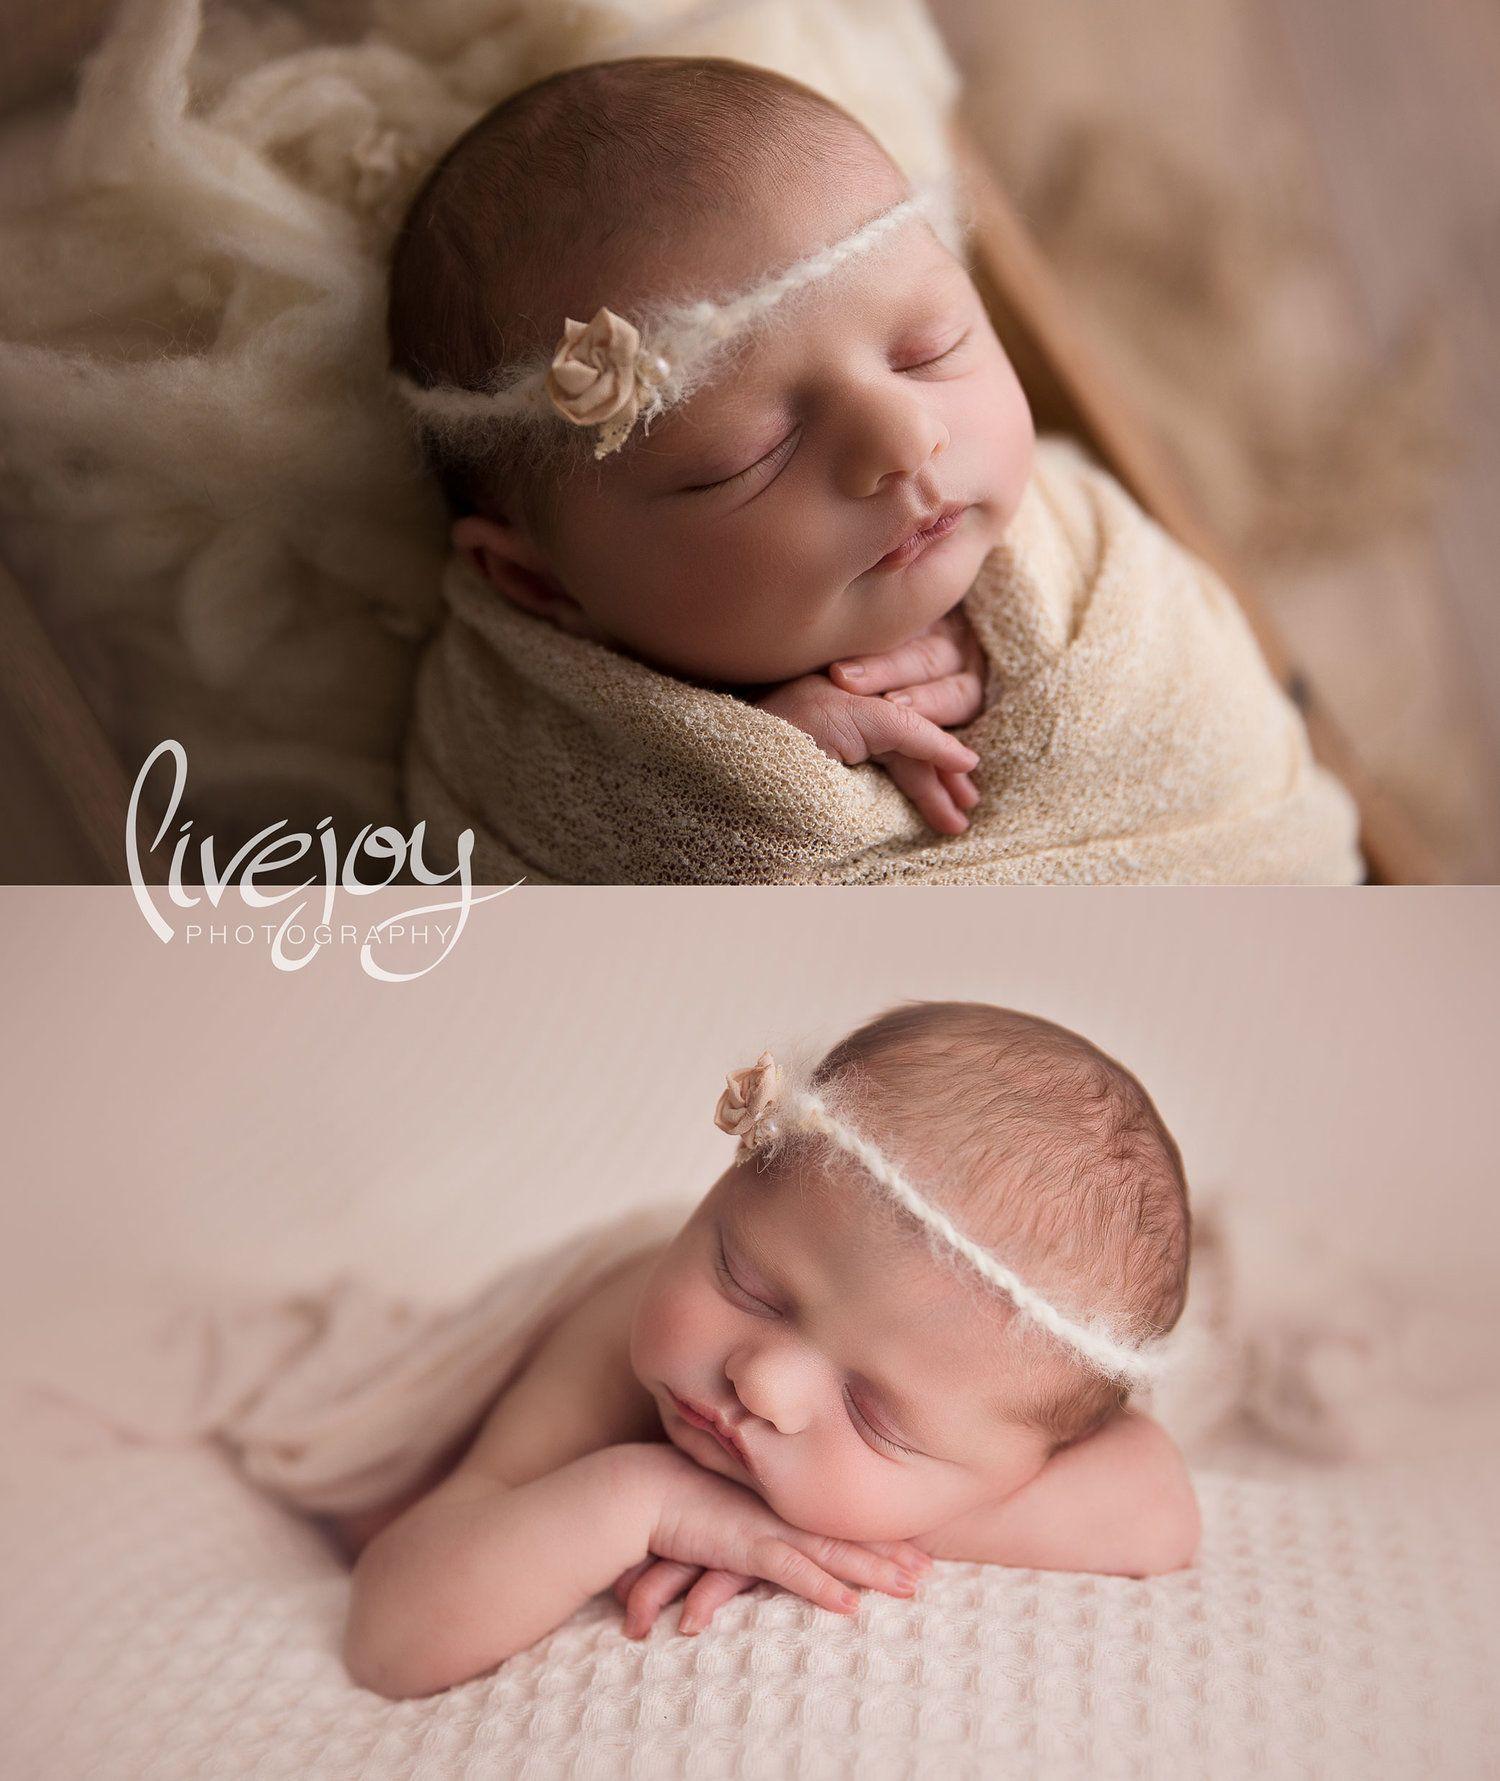 Newborn photography oregon livejoy photography